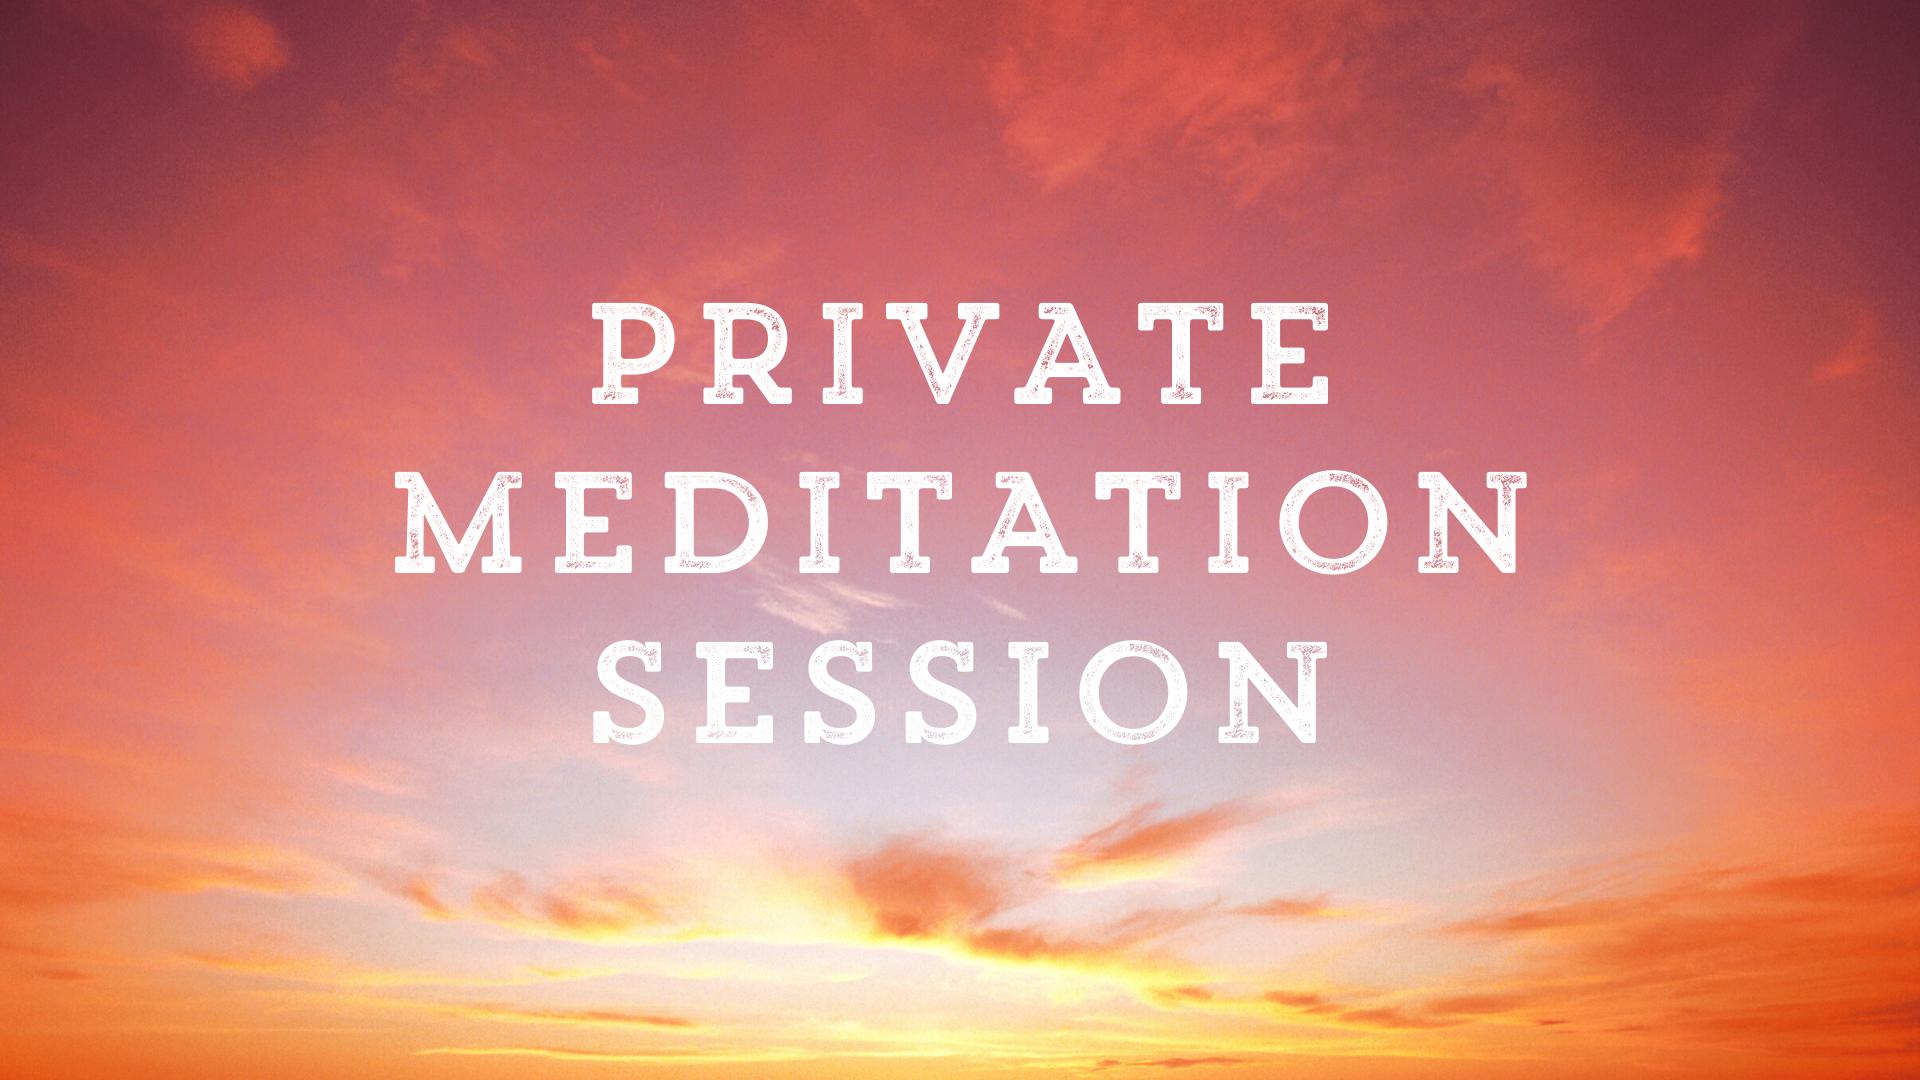 Private Meditation Session